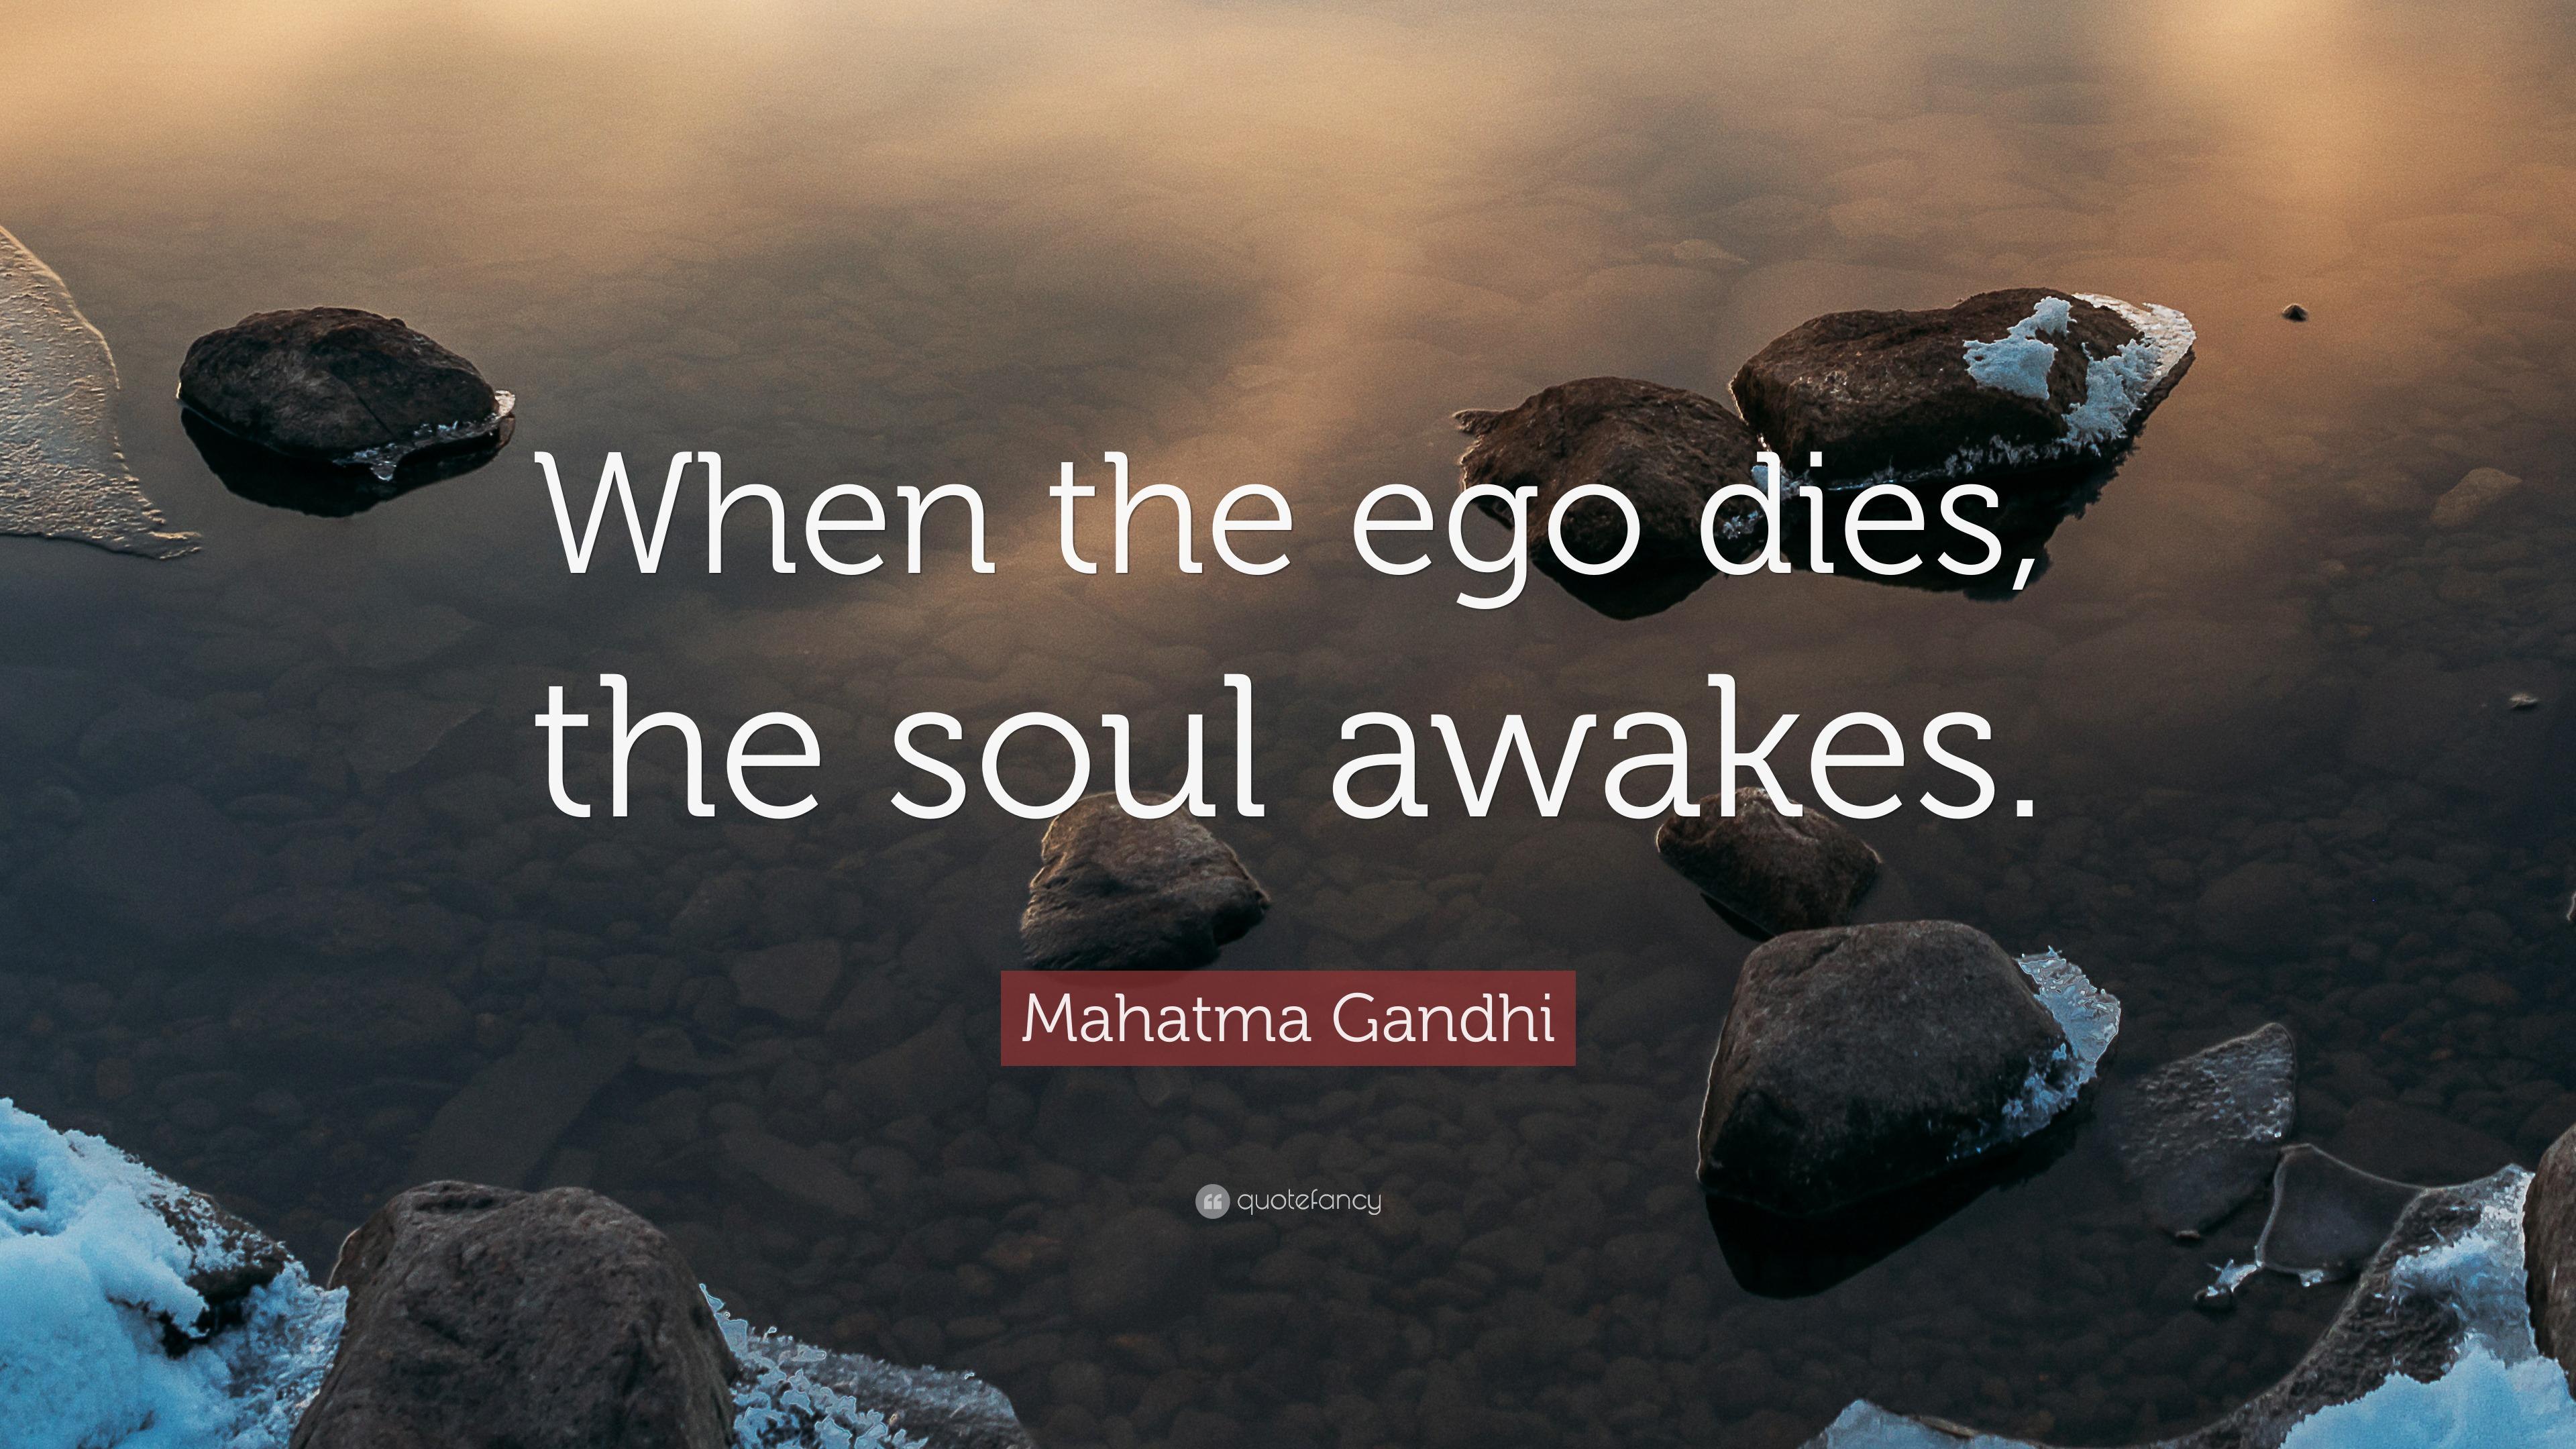 2059504 Mahatma Gandhi Quote When the ego dies the soul awakes